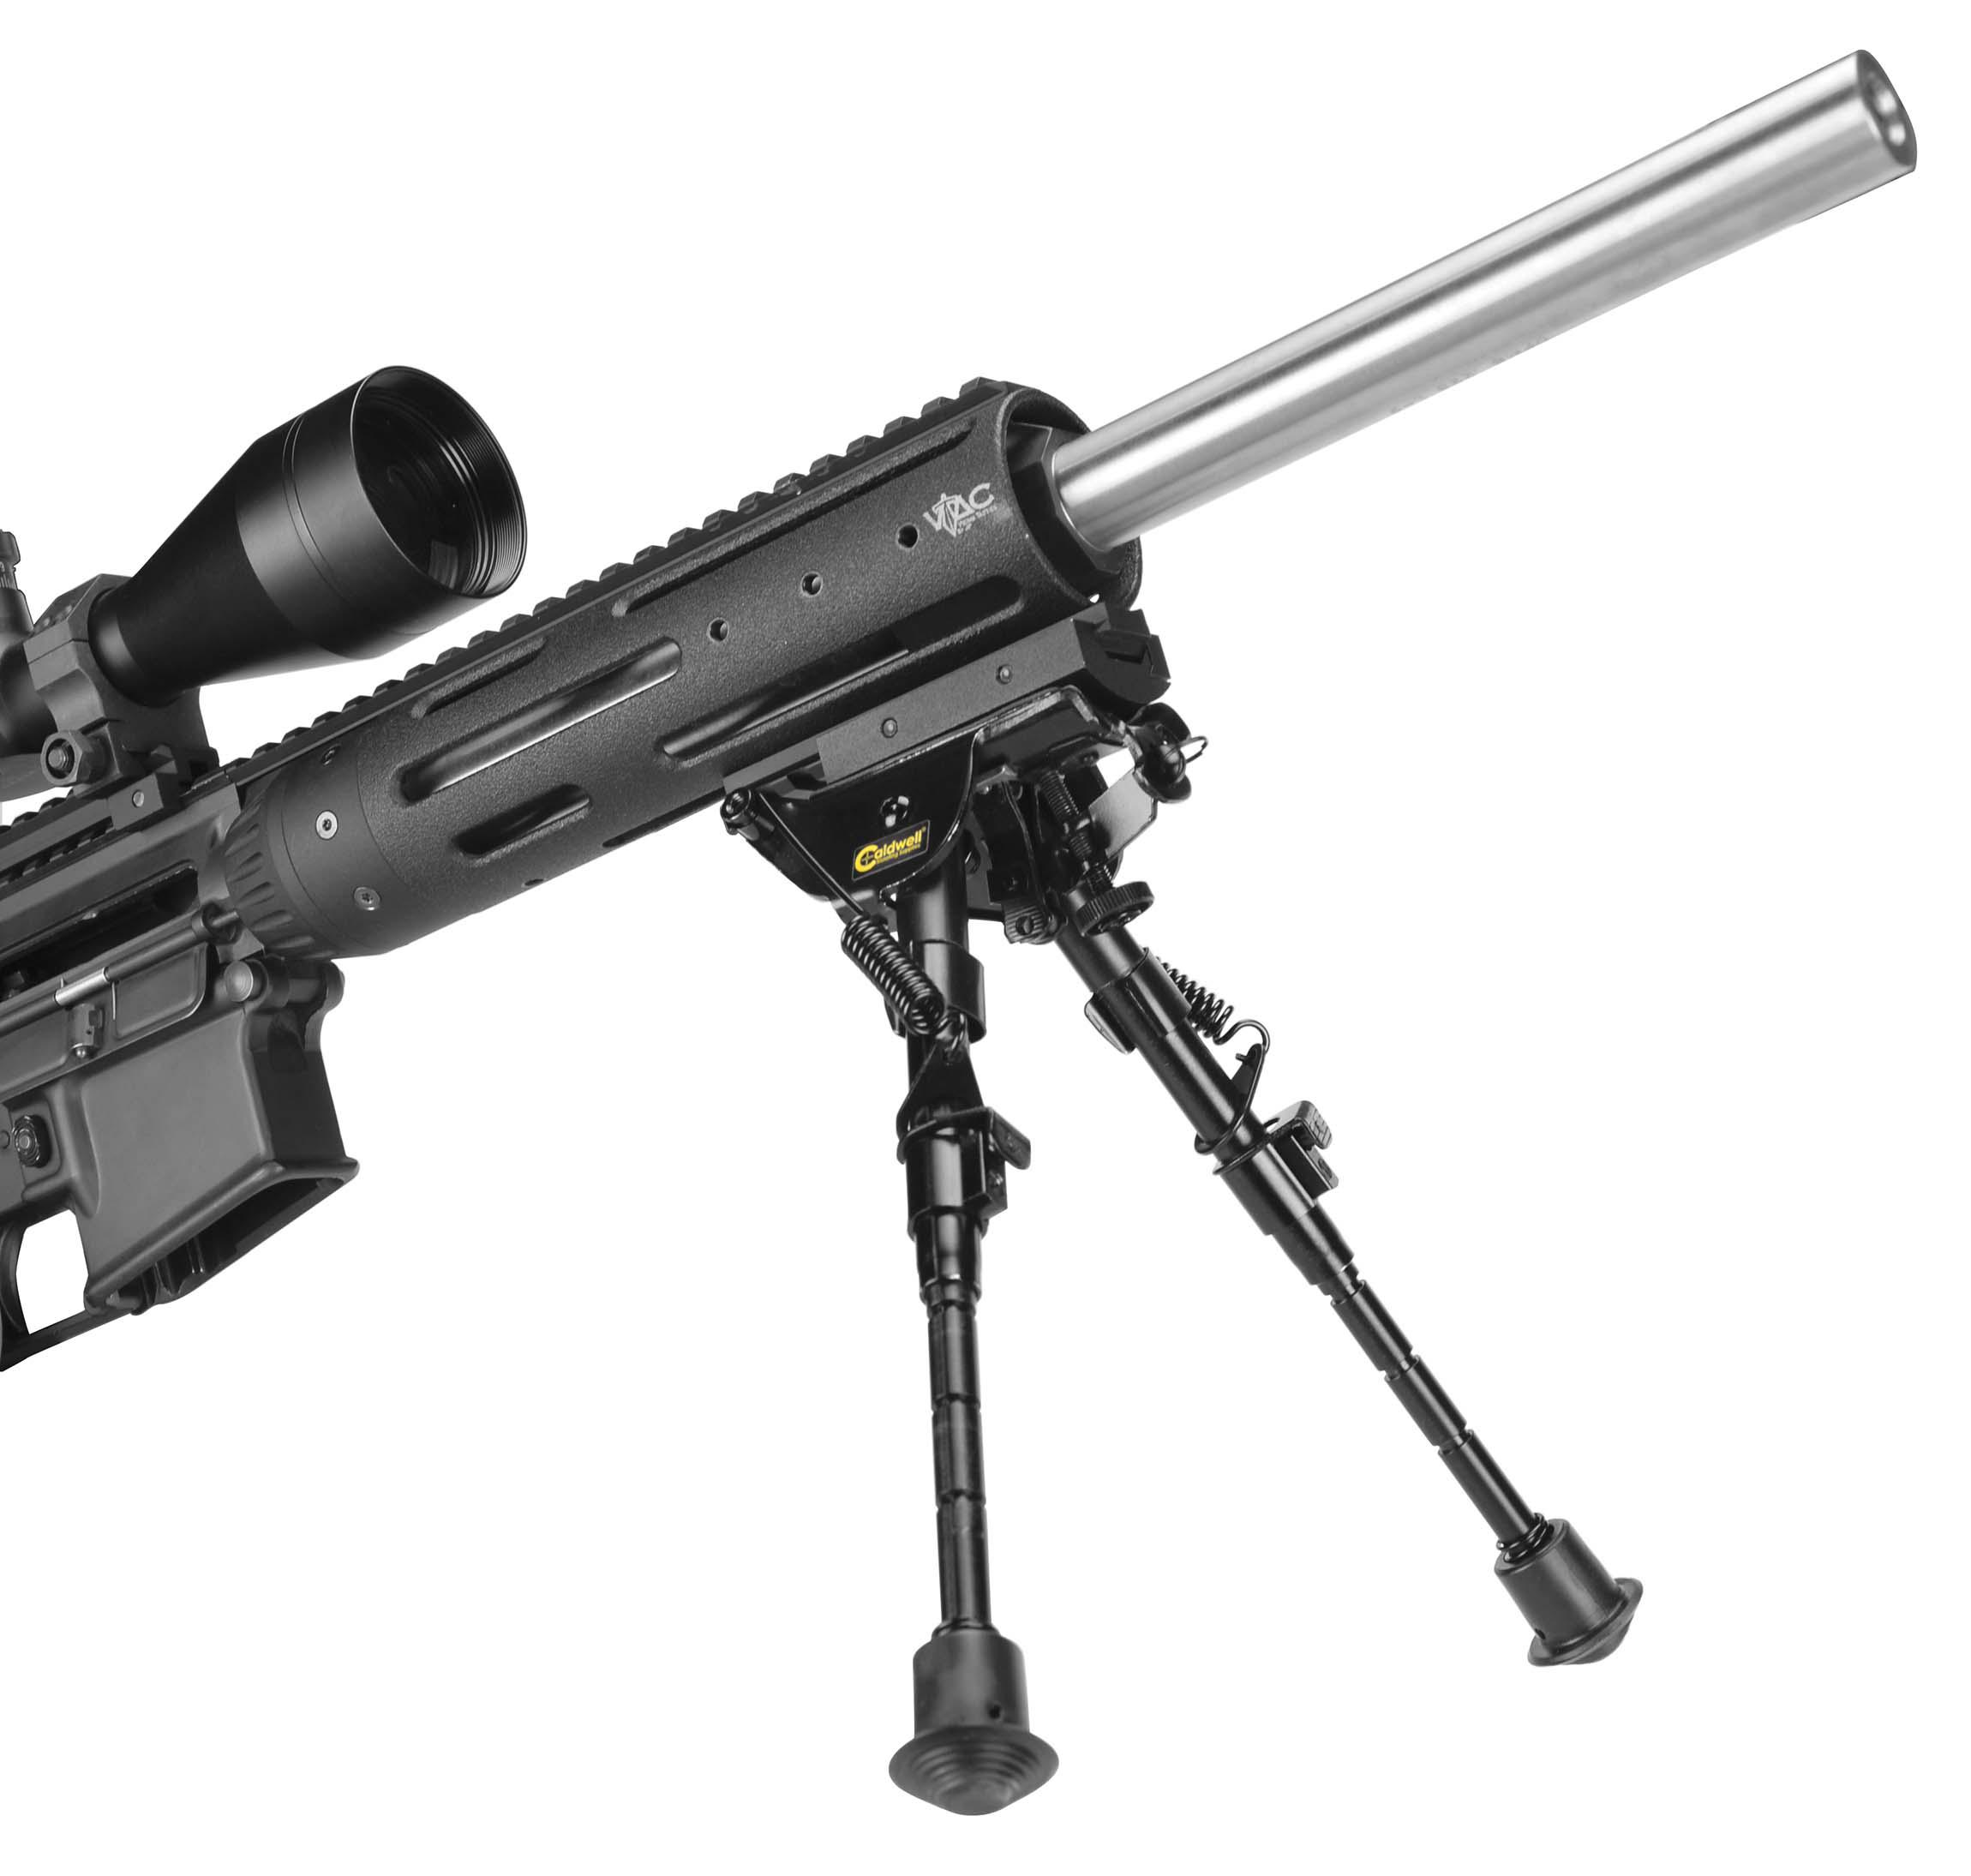 Bipod Adaptor for Picatinney Rail - 535423 gun bipod